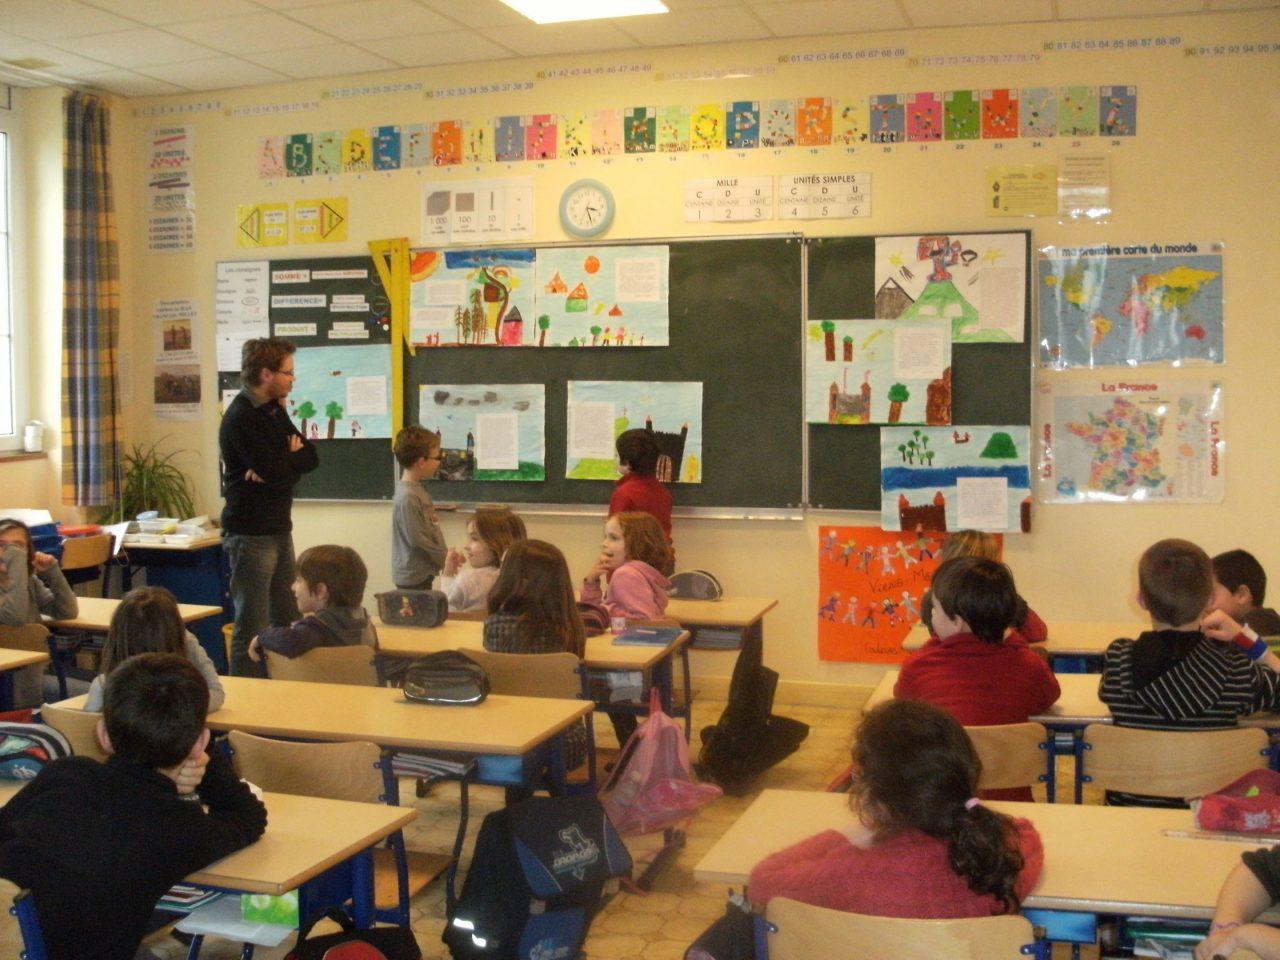 school-in-france-1280x960.jpg